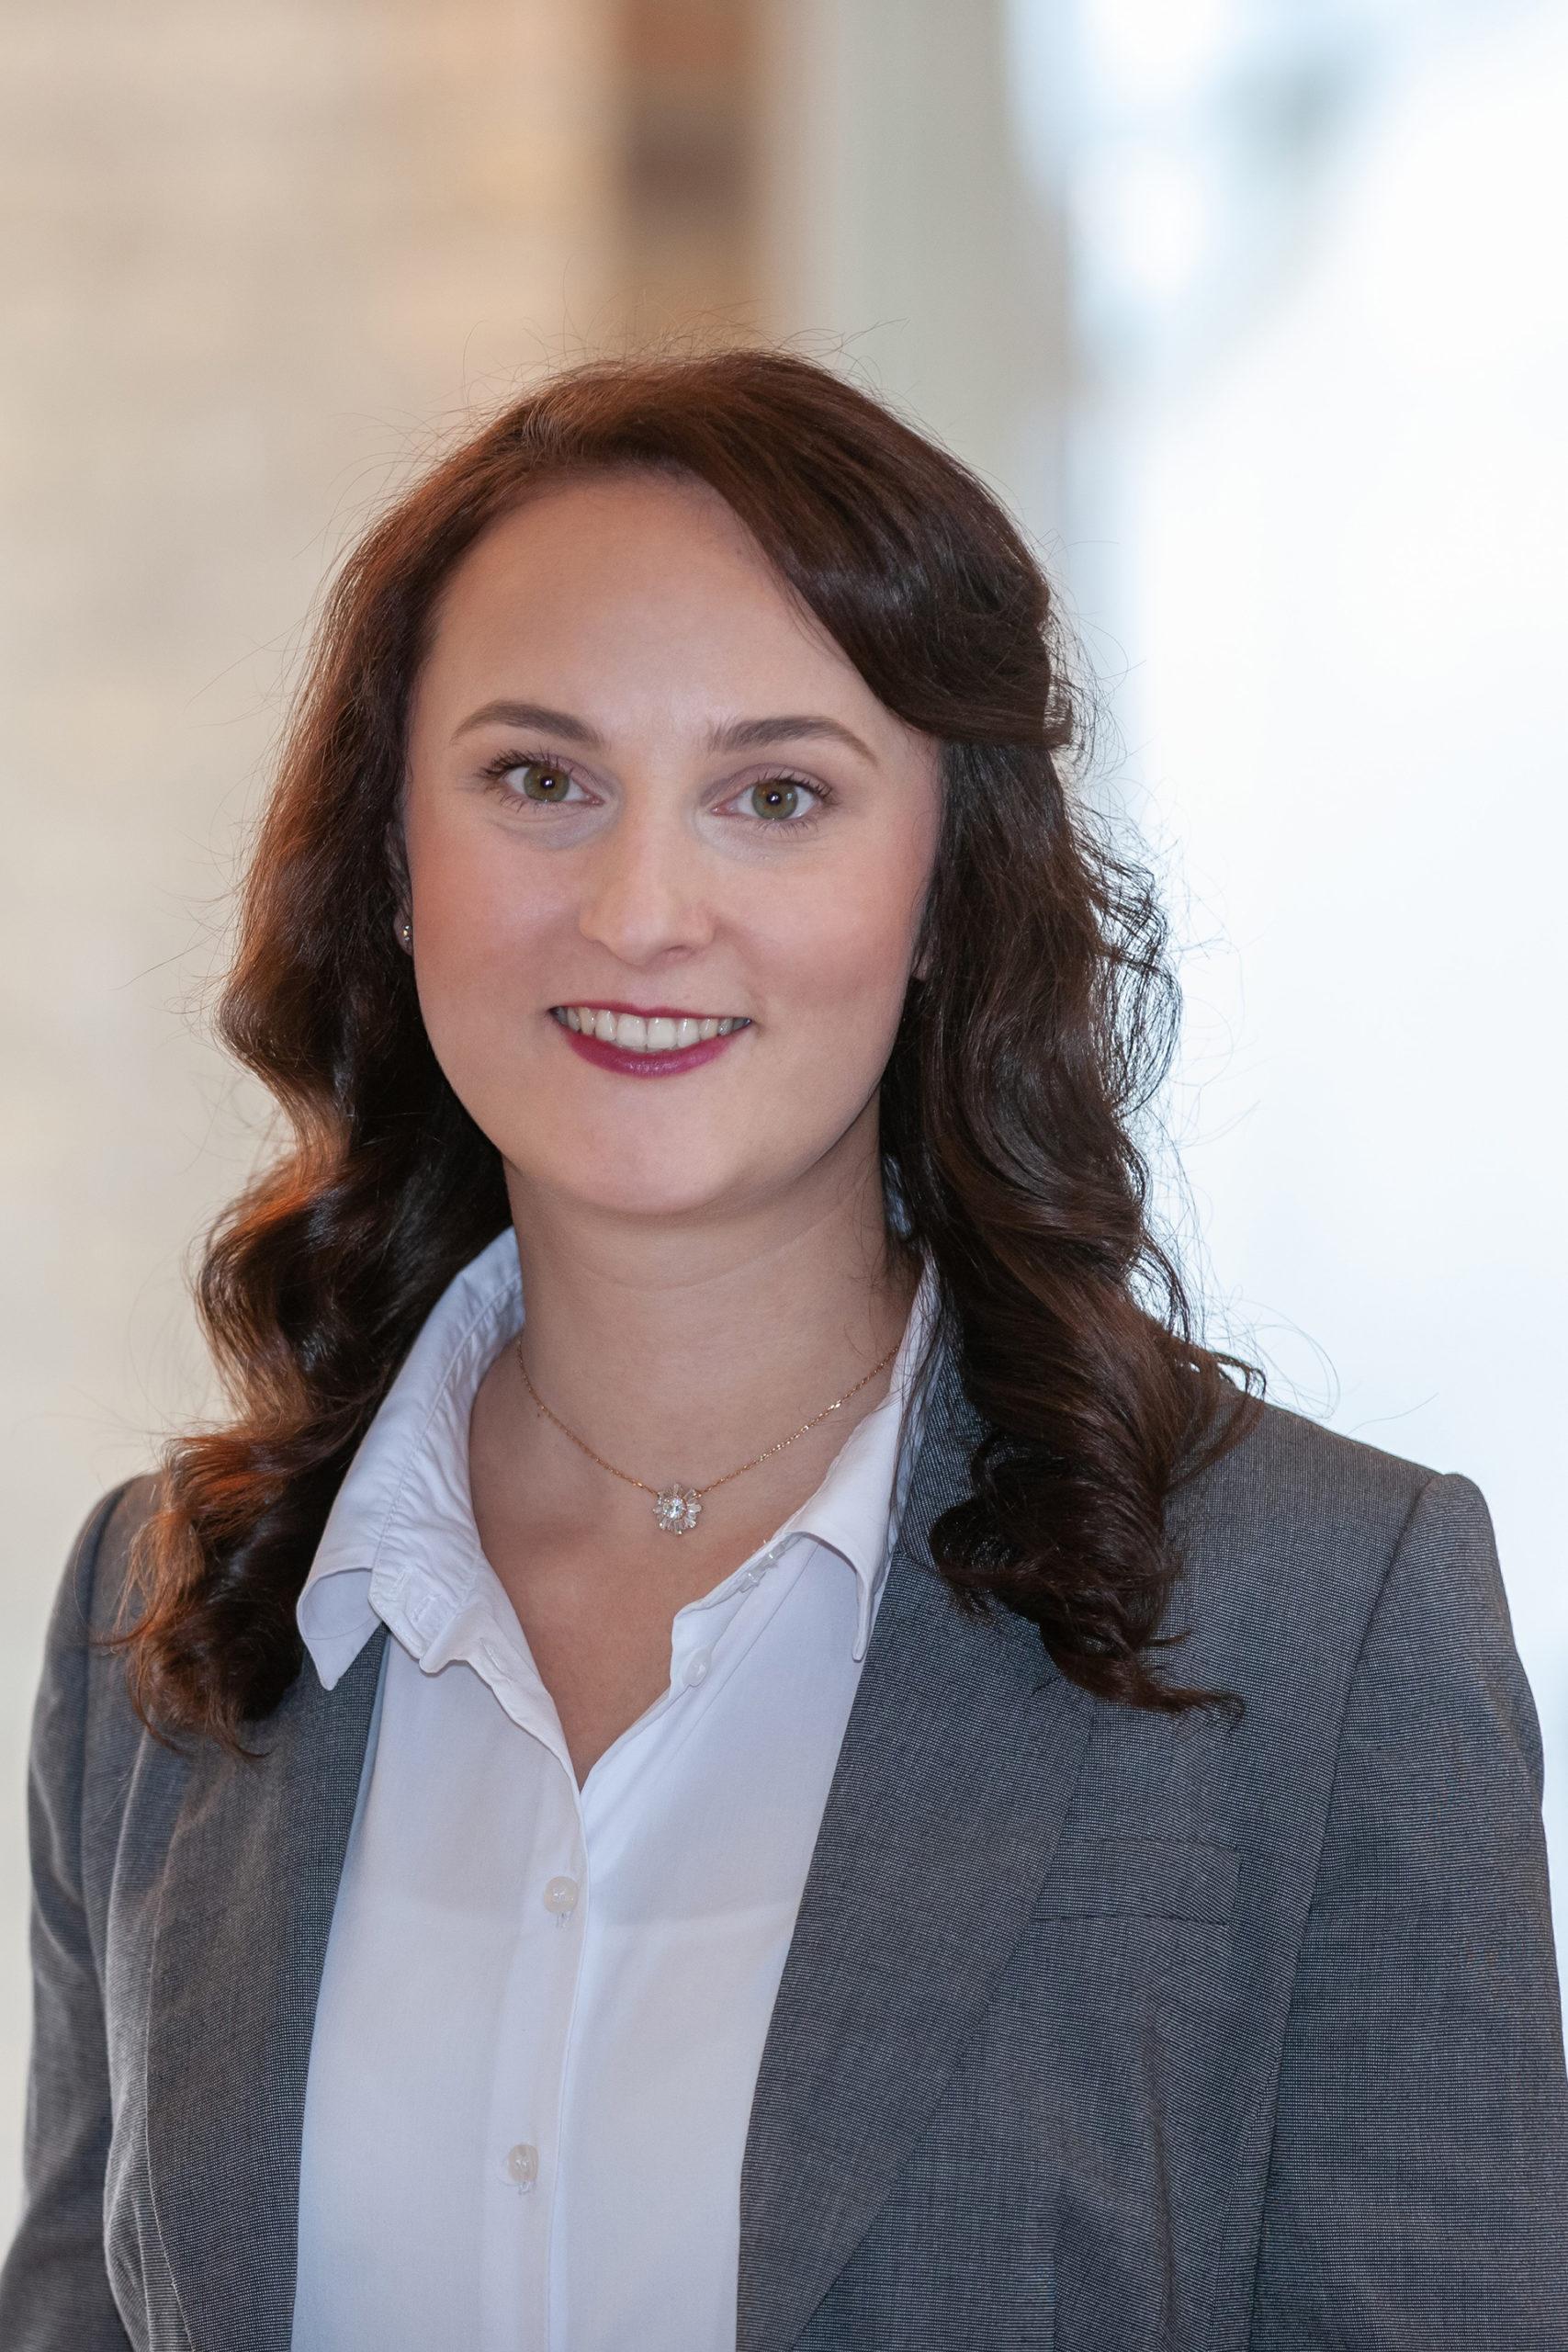 Paulina Jähningen